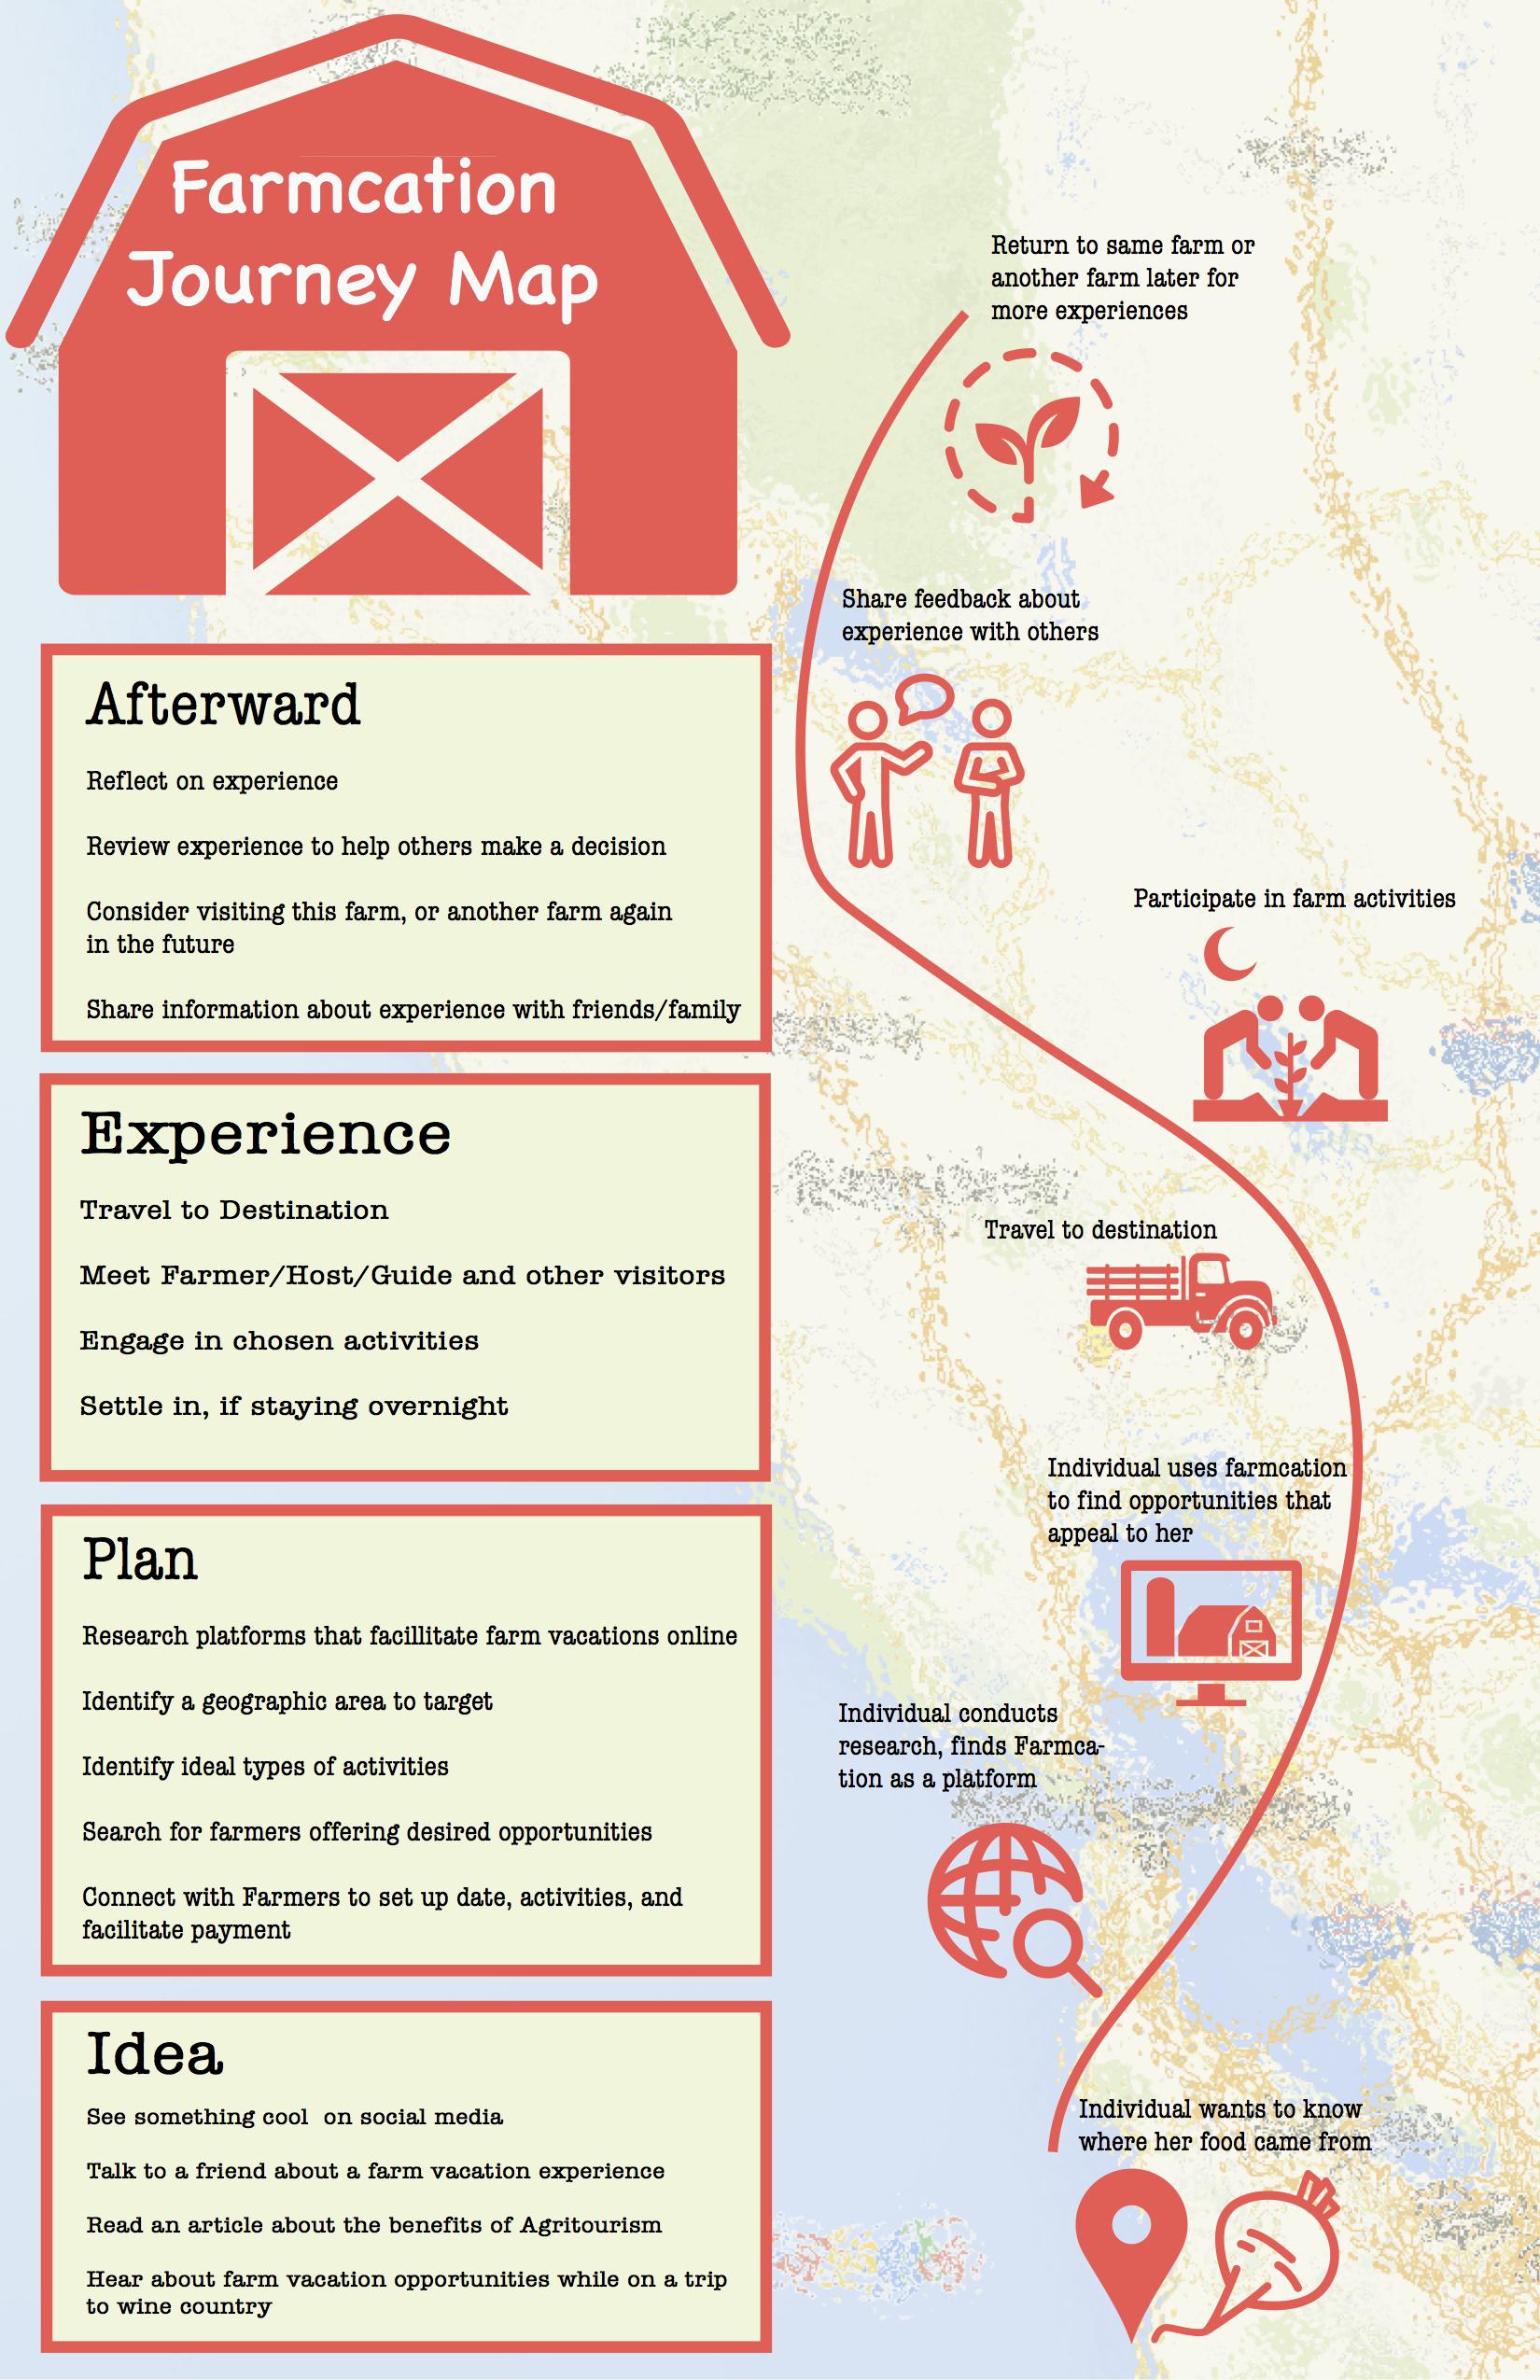 Journey Map based on customer interviews